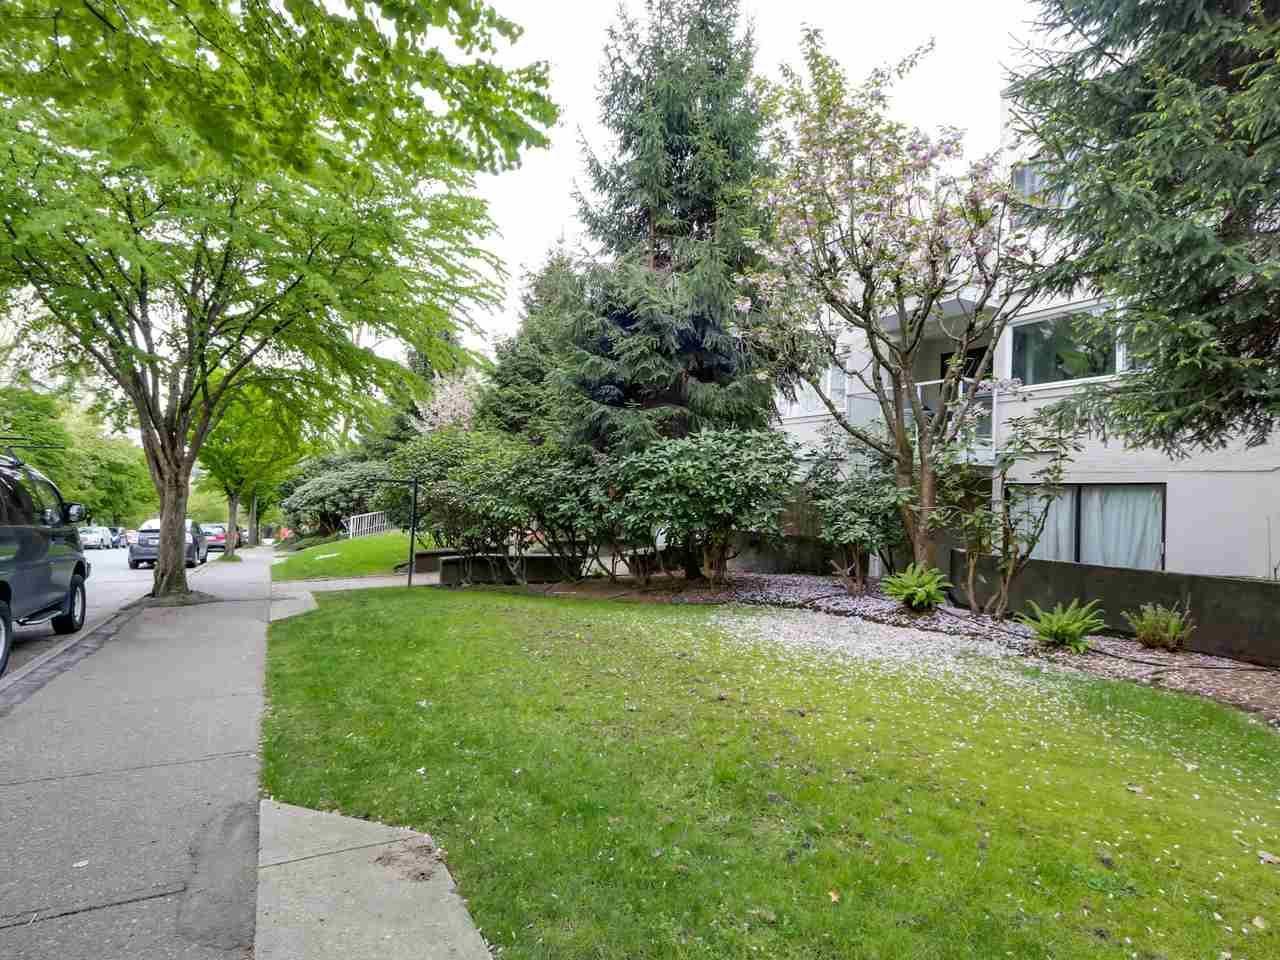 "Main Photo: 204 830 E 7TH Avenue in Vancouver: Mount Pleasant VE Condo for sale in ""FAIRFAX"" (Vancouver East)  : MLS®# R2083827"